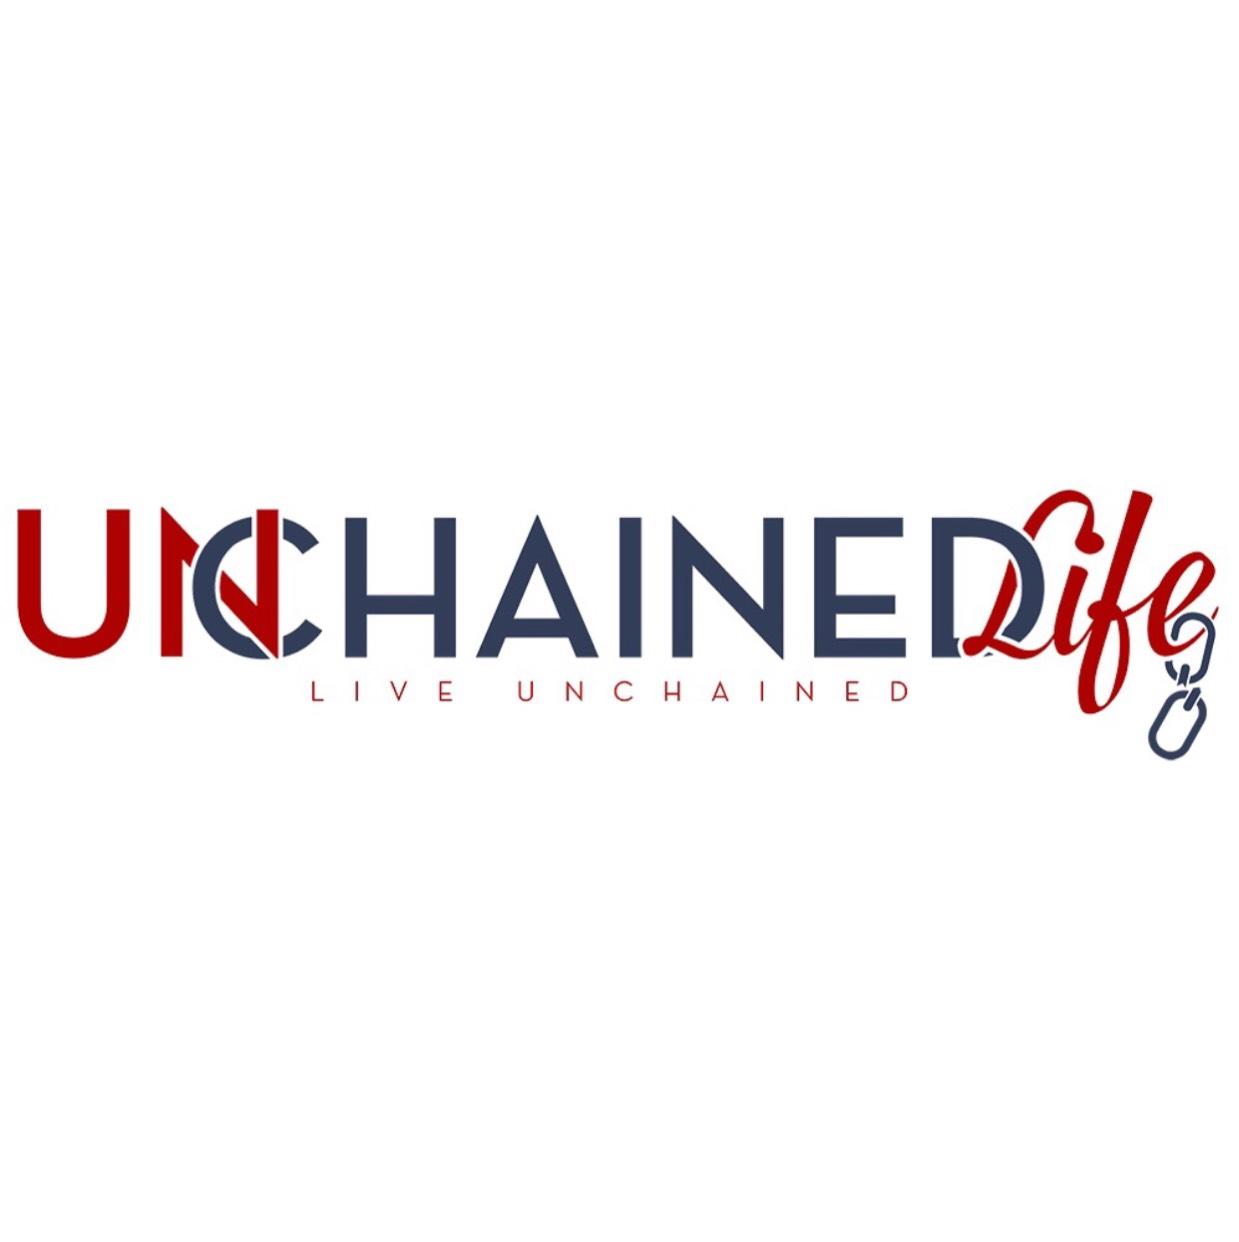 unchainedlifepodcast